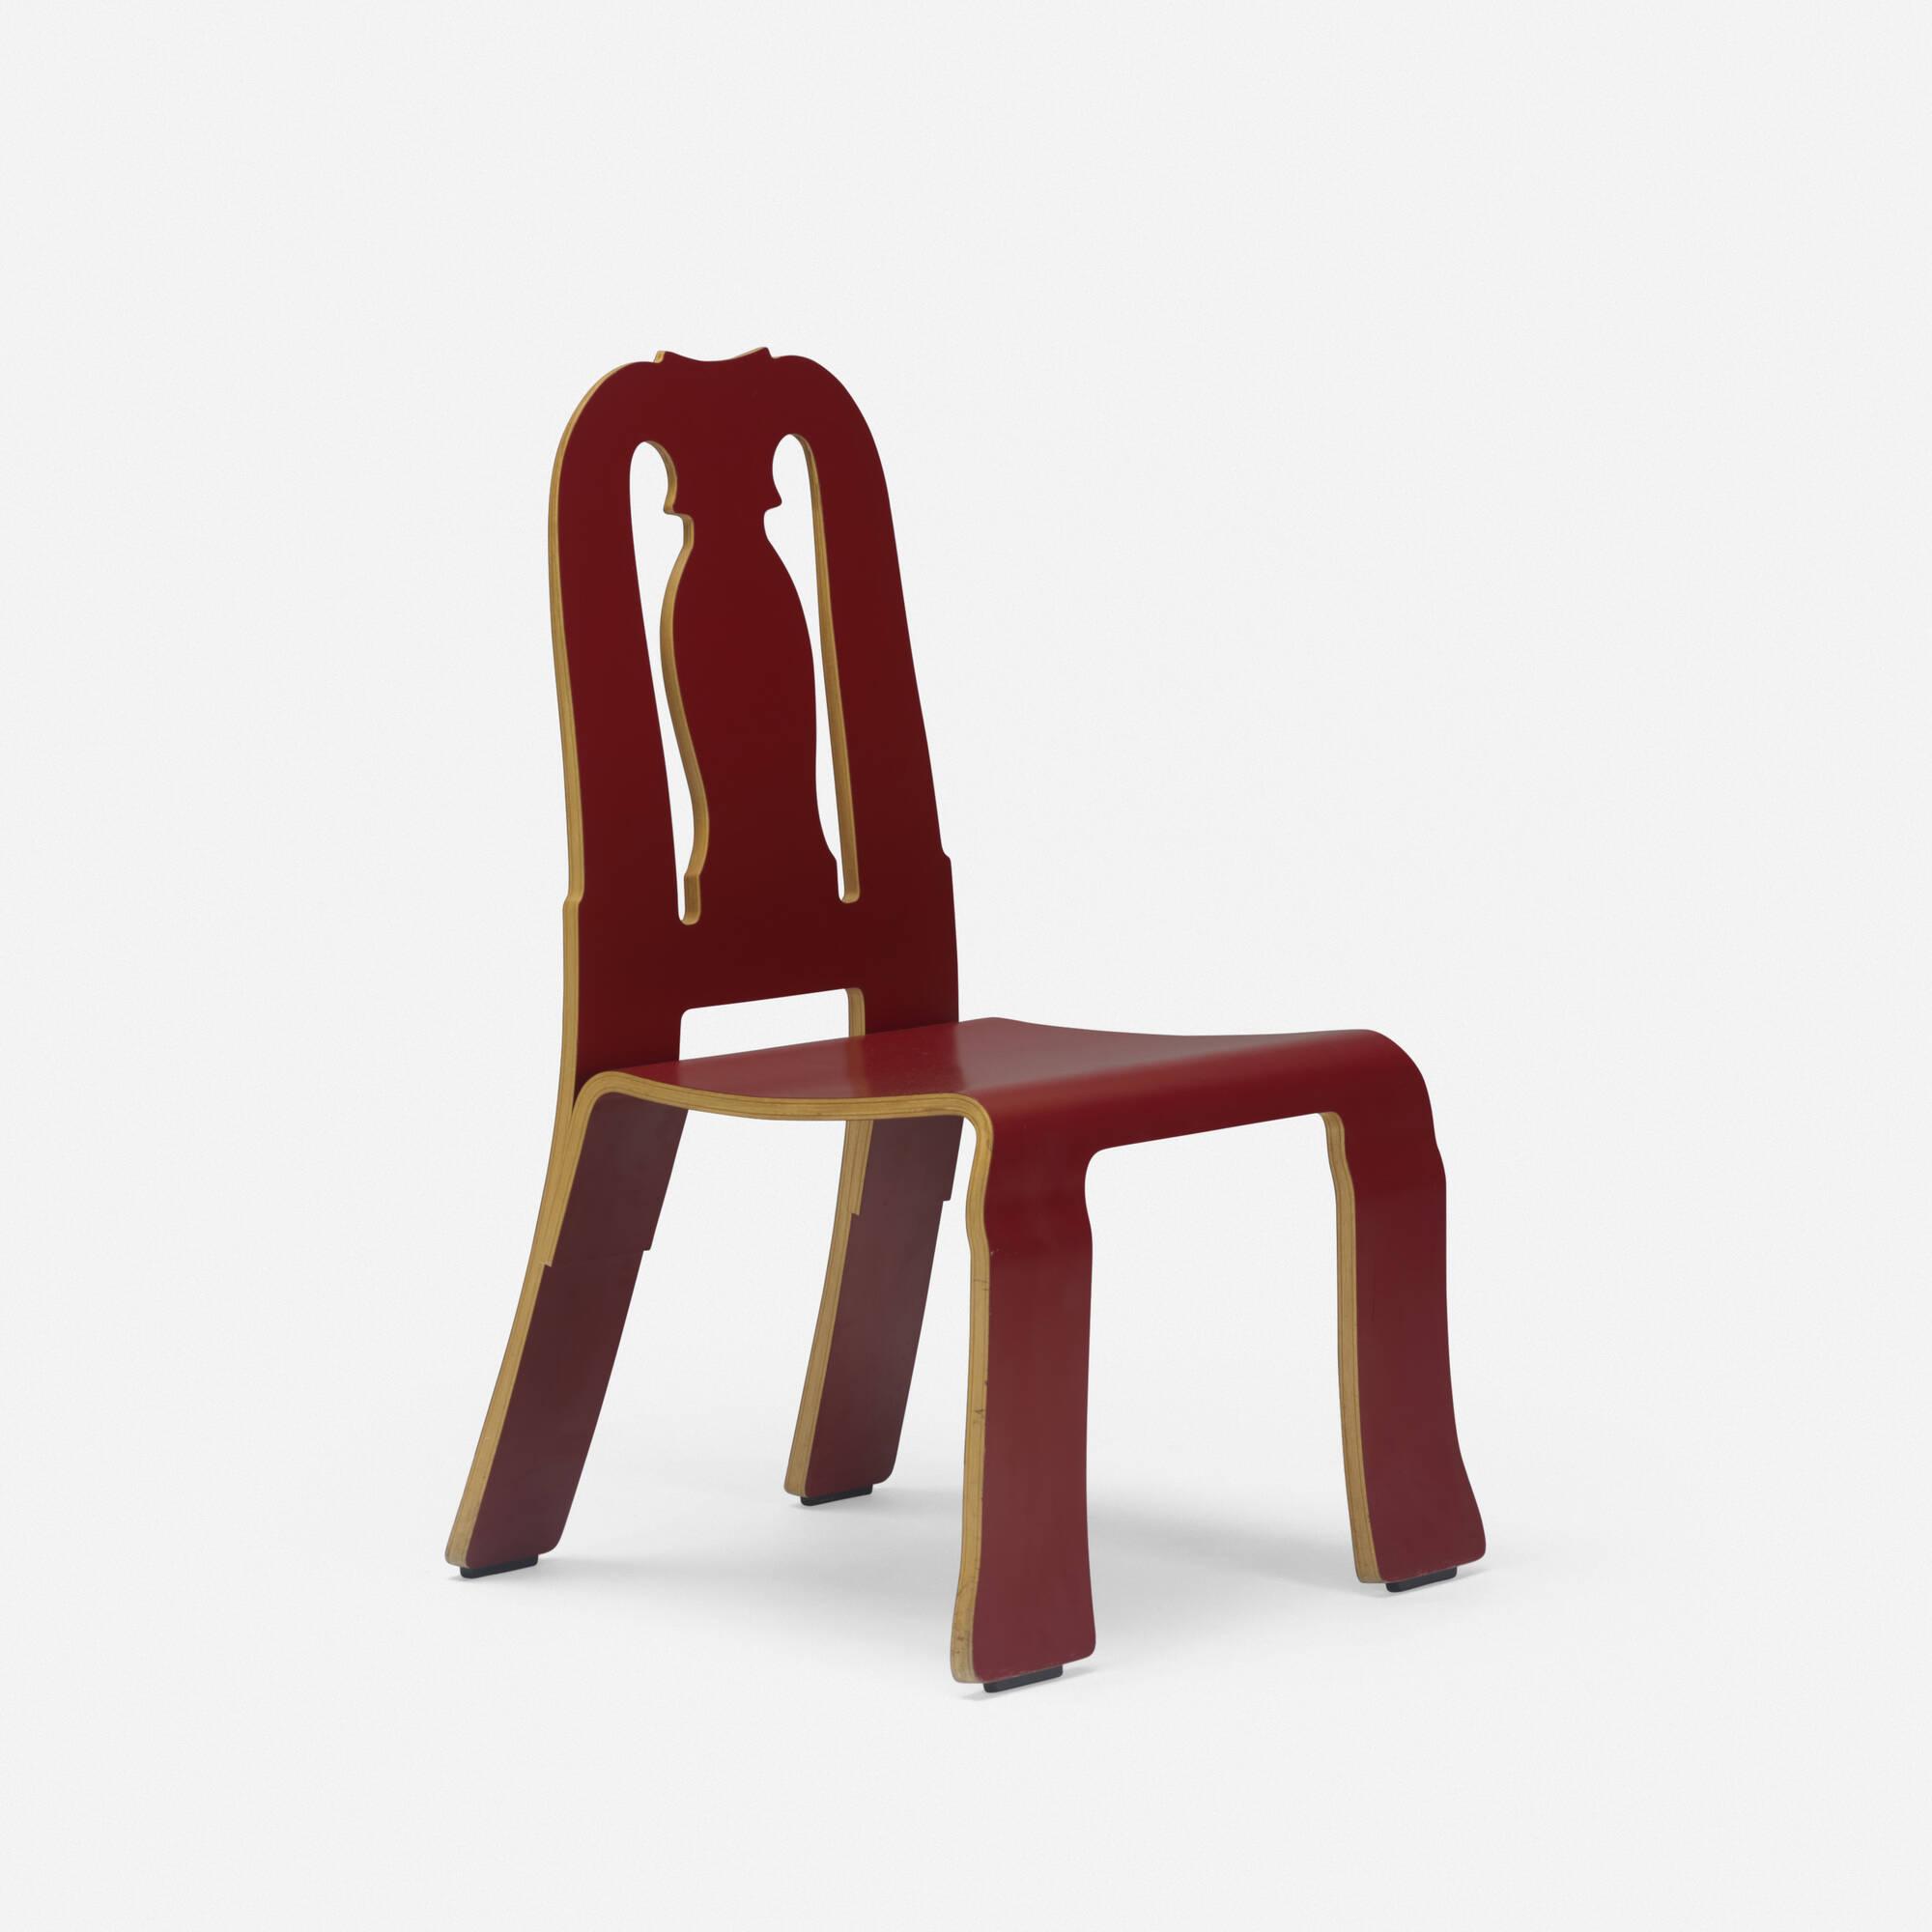 406: Robert Venturi / Queen Anne chair (2 of 2)